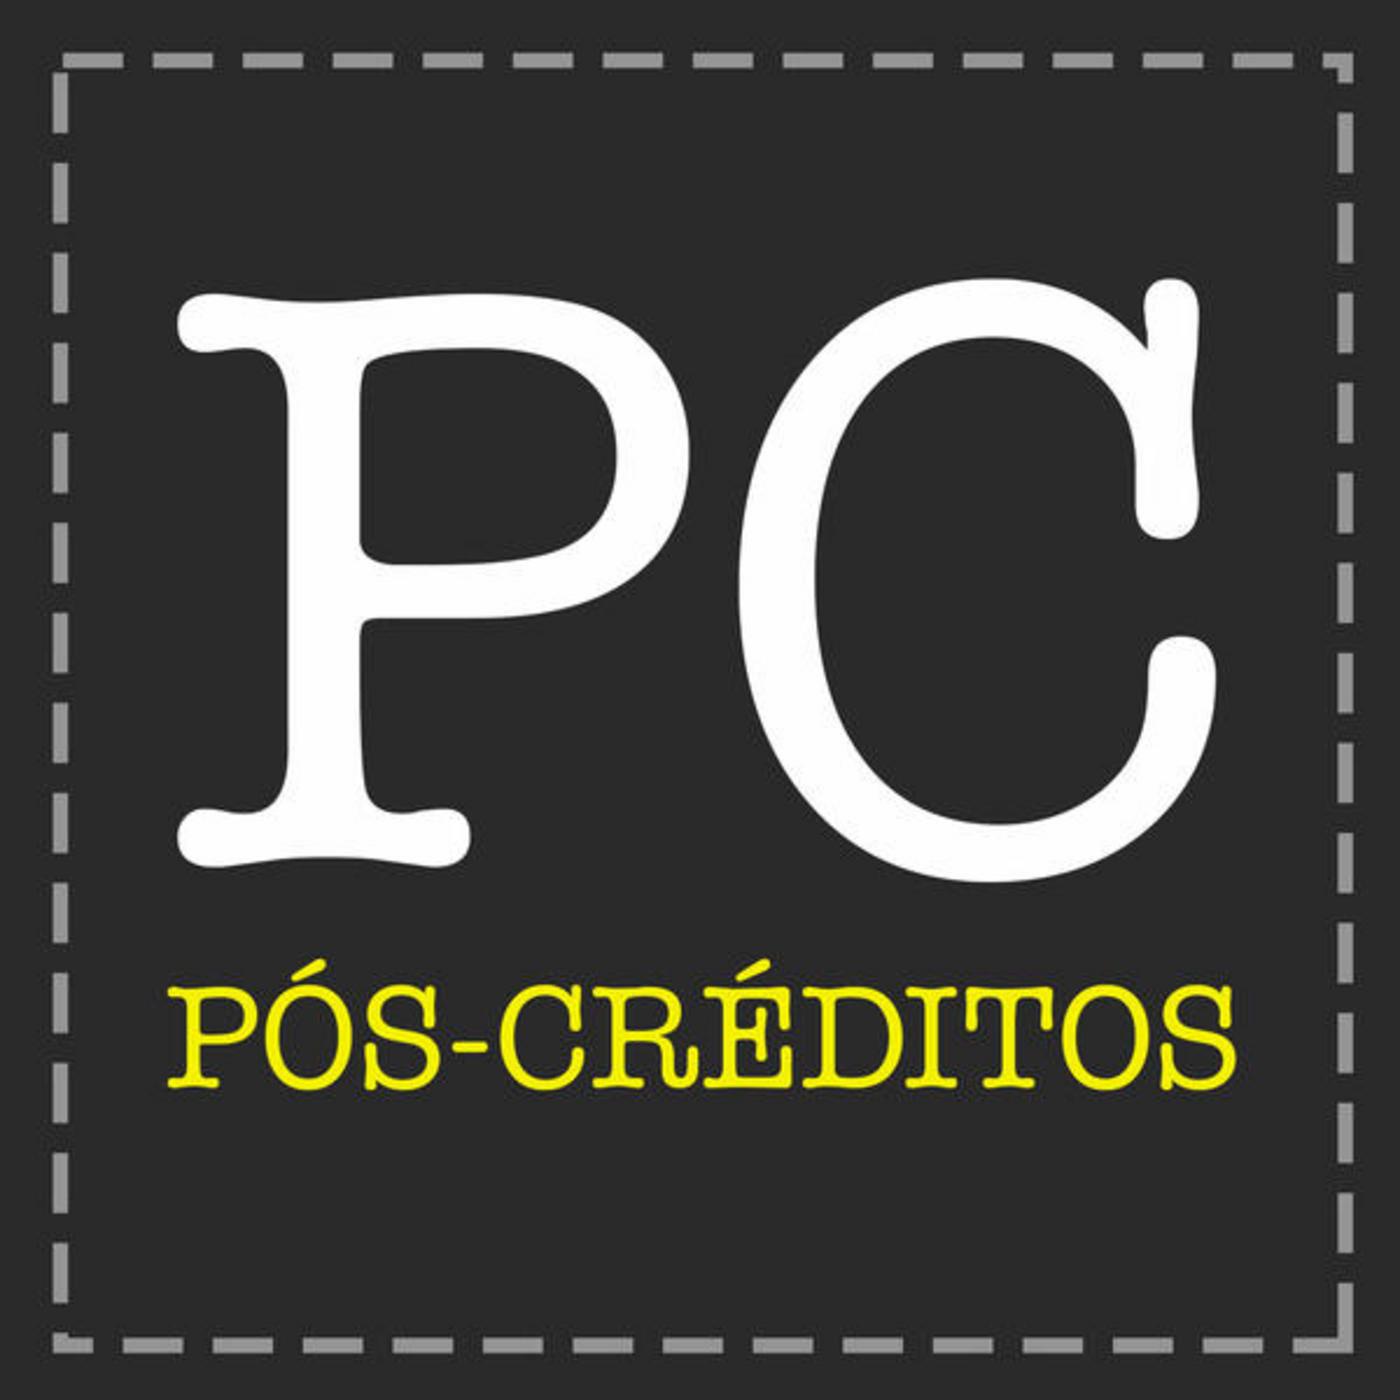 #020 – Creed: Nascido para a porradaria